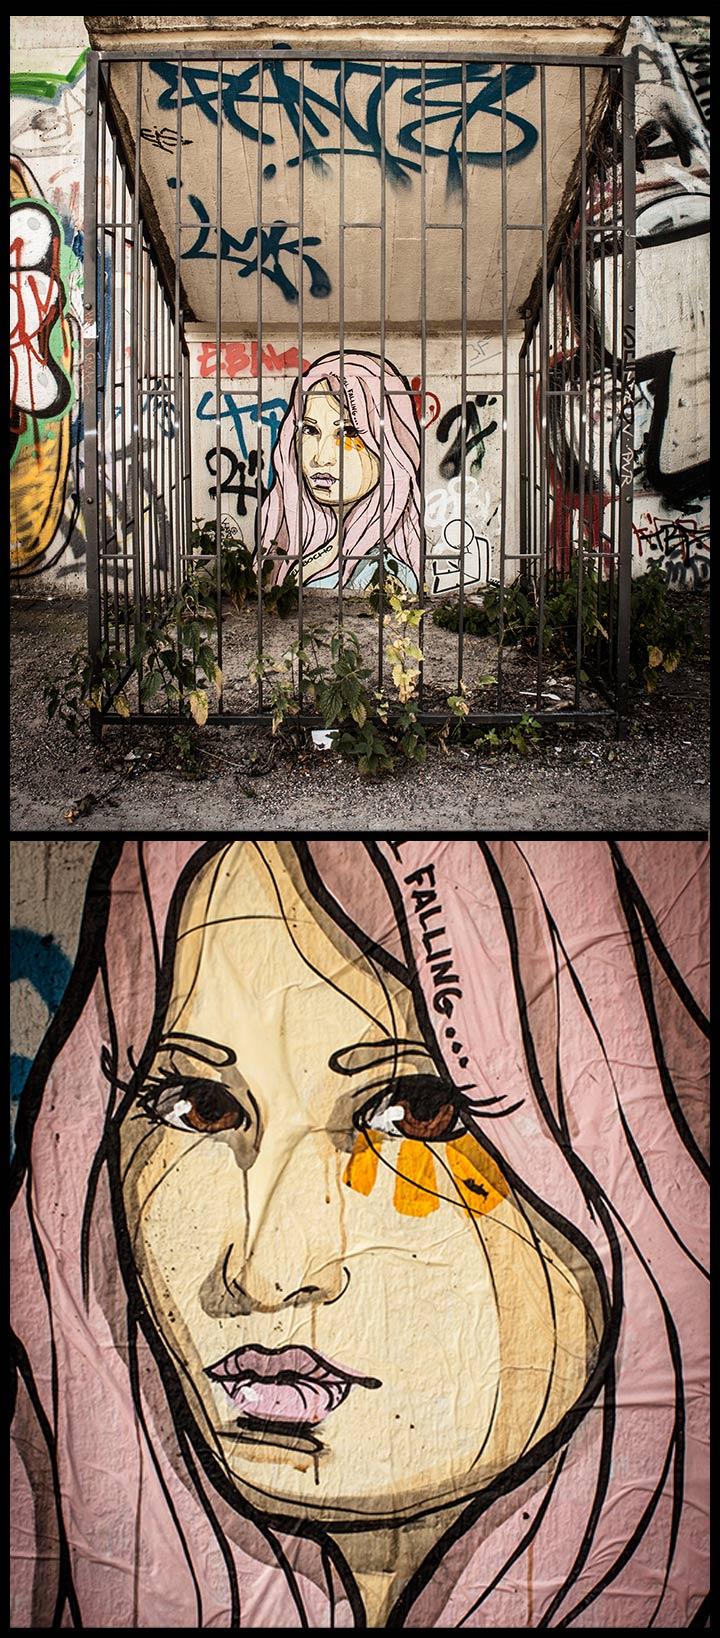 El-bocho-streetart-3